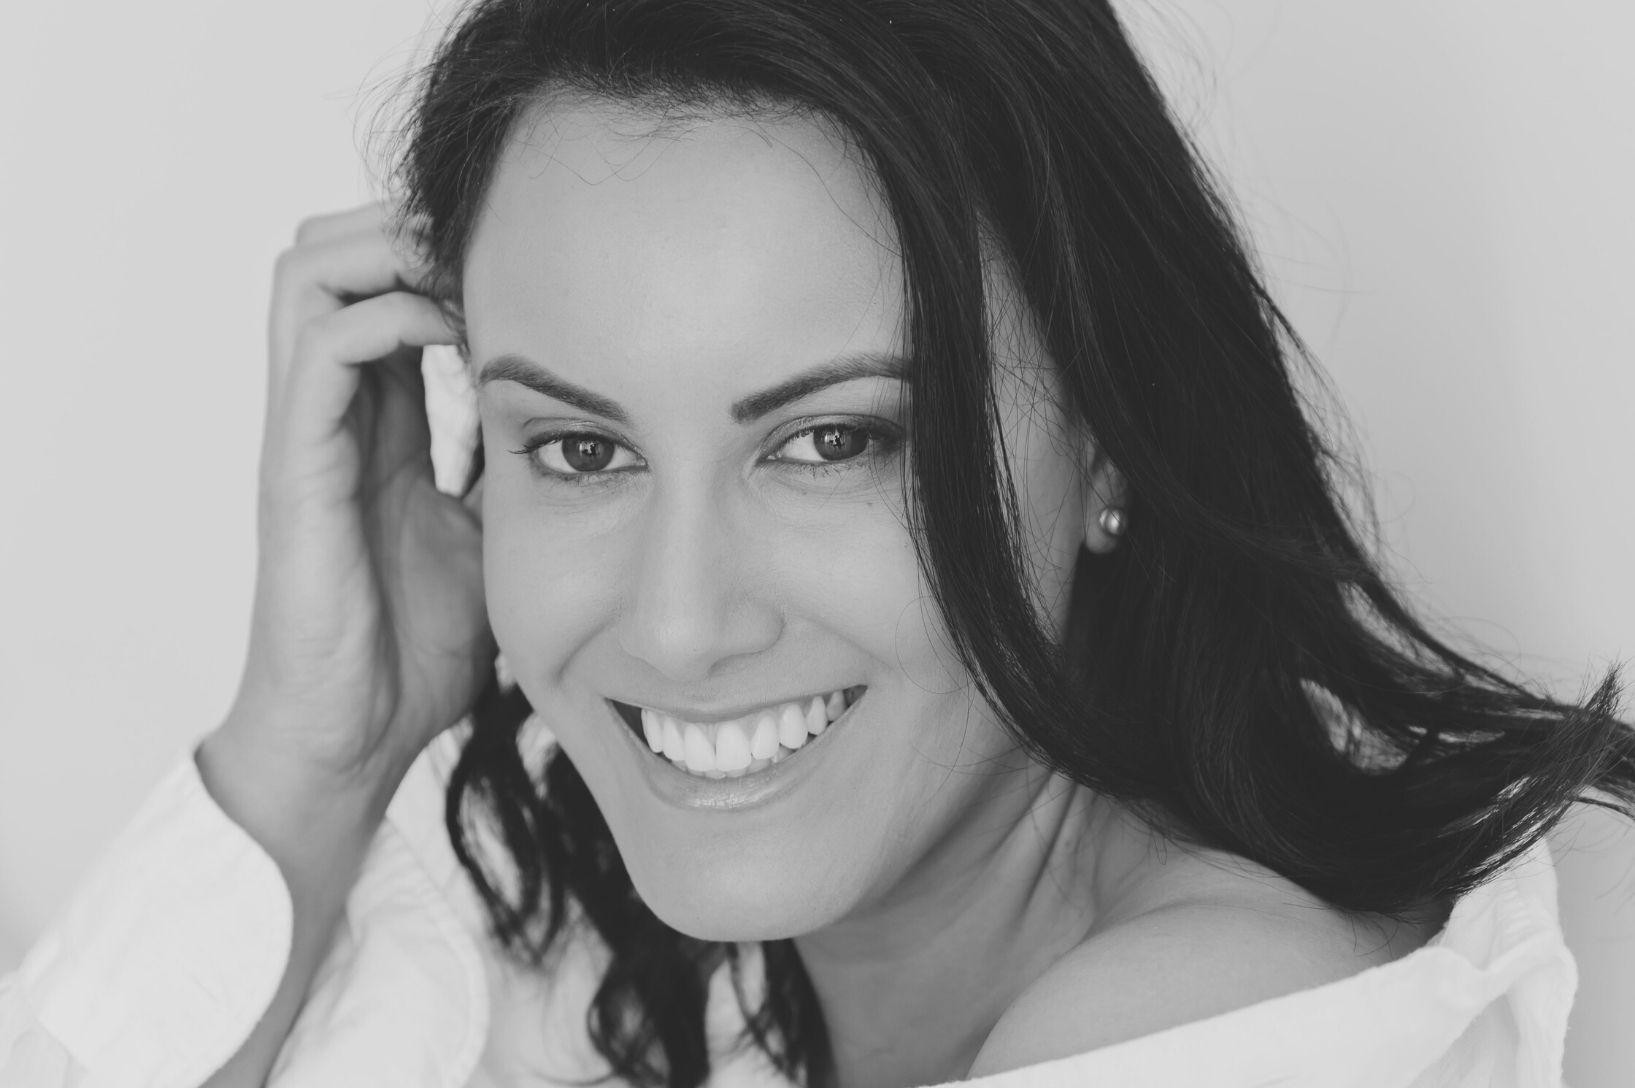 A candid interview with Maori model Tia Pirihi.